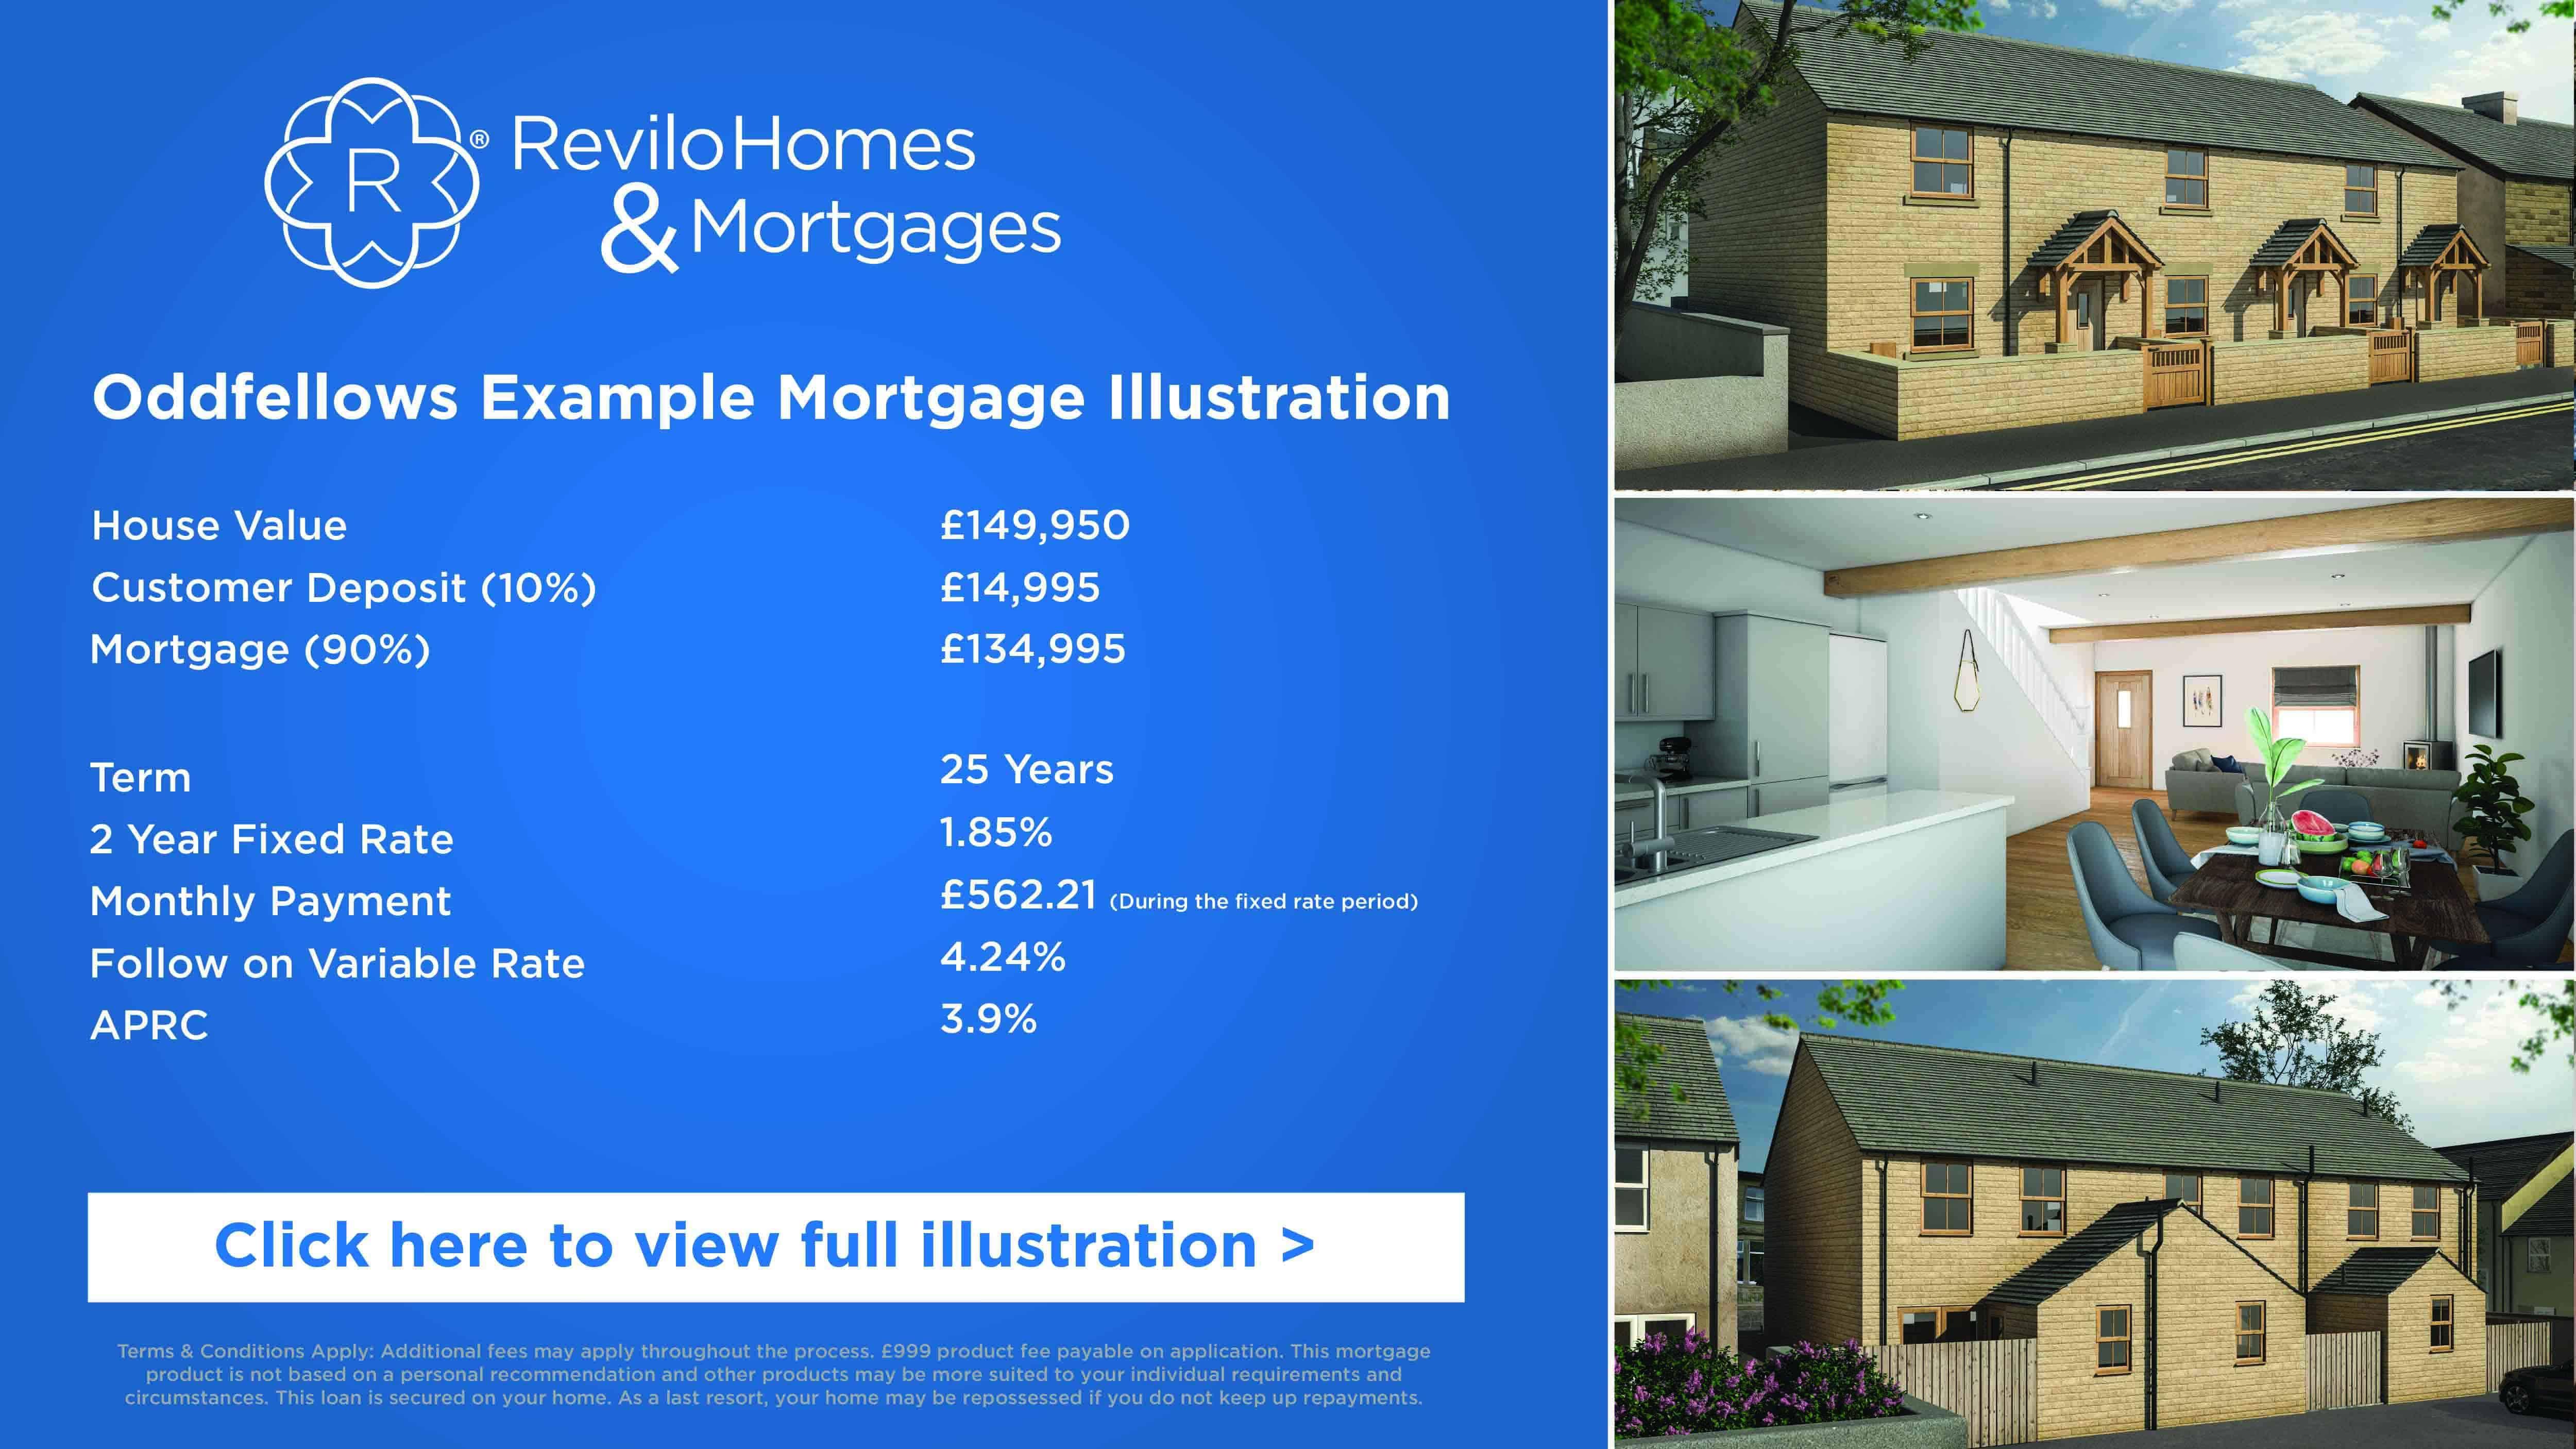 £149k Non HTB Oddfellows Mortgage Illustration website 1200 x 675_V5